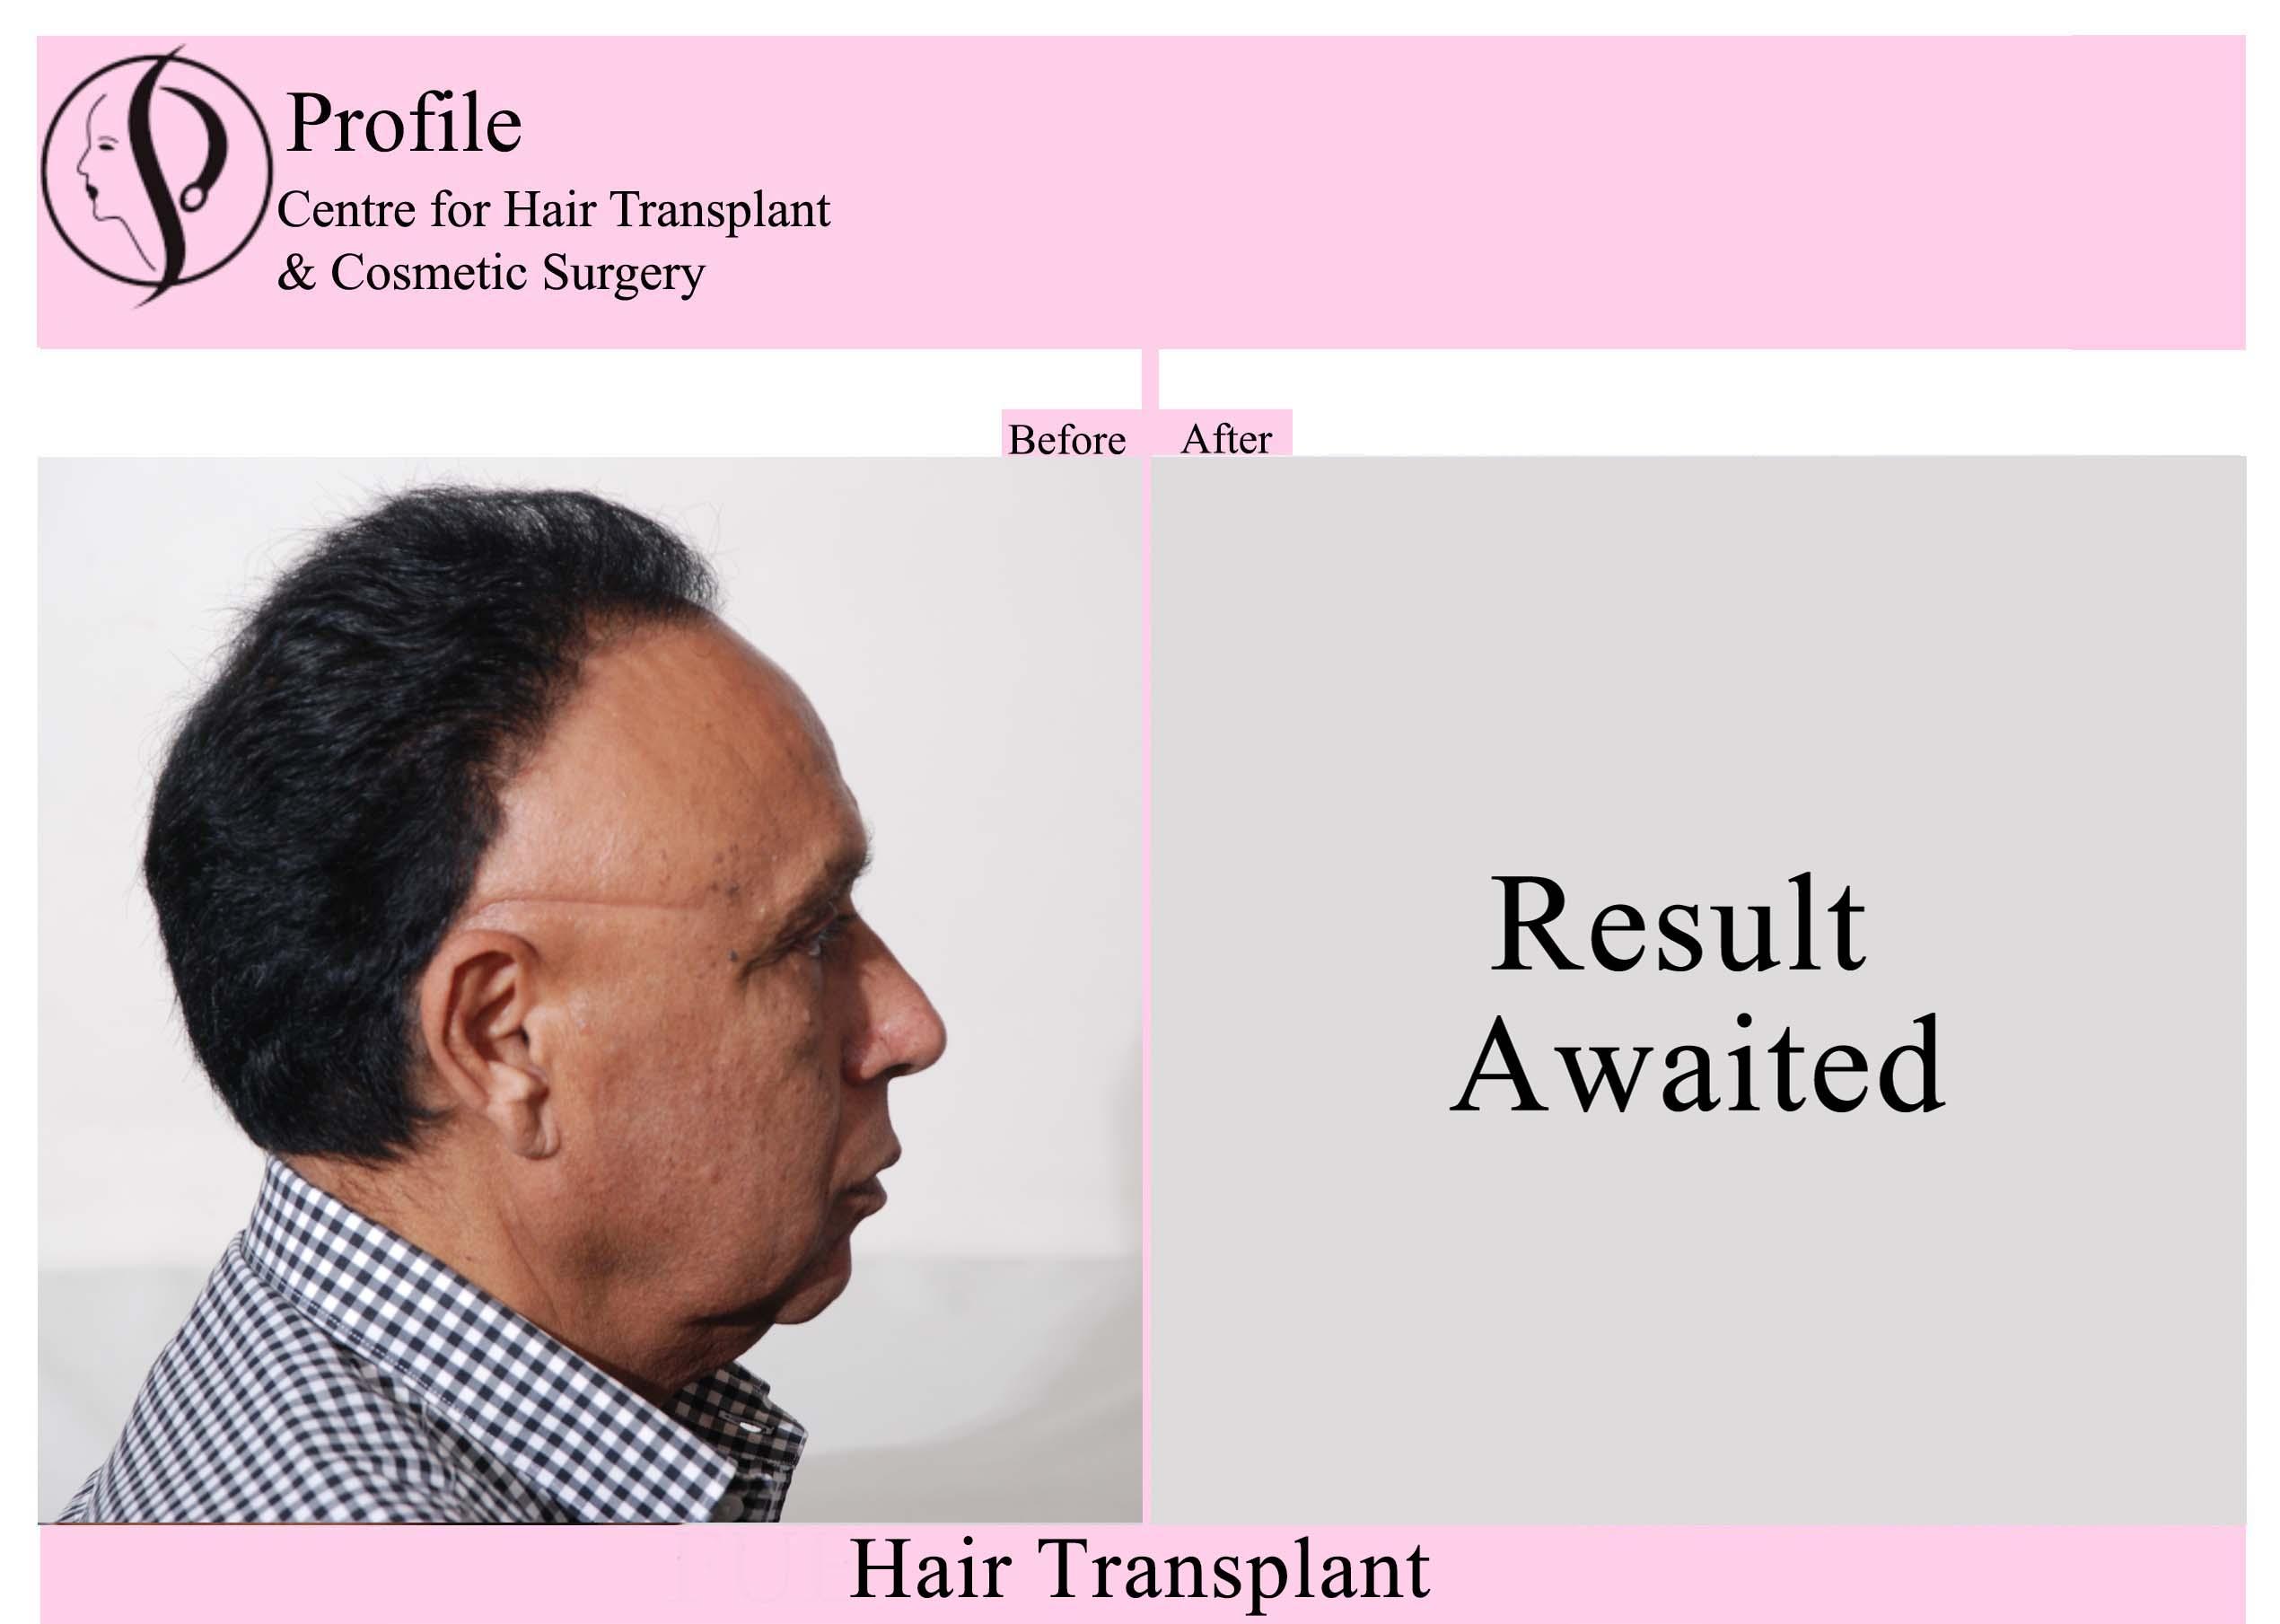 Dr. Palwinder Singh